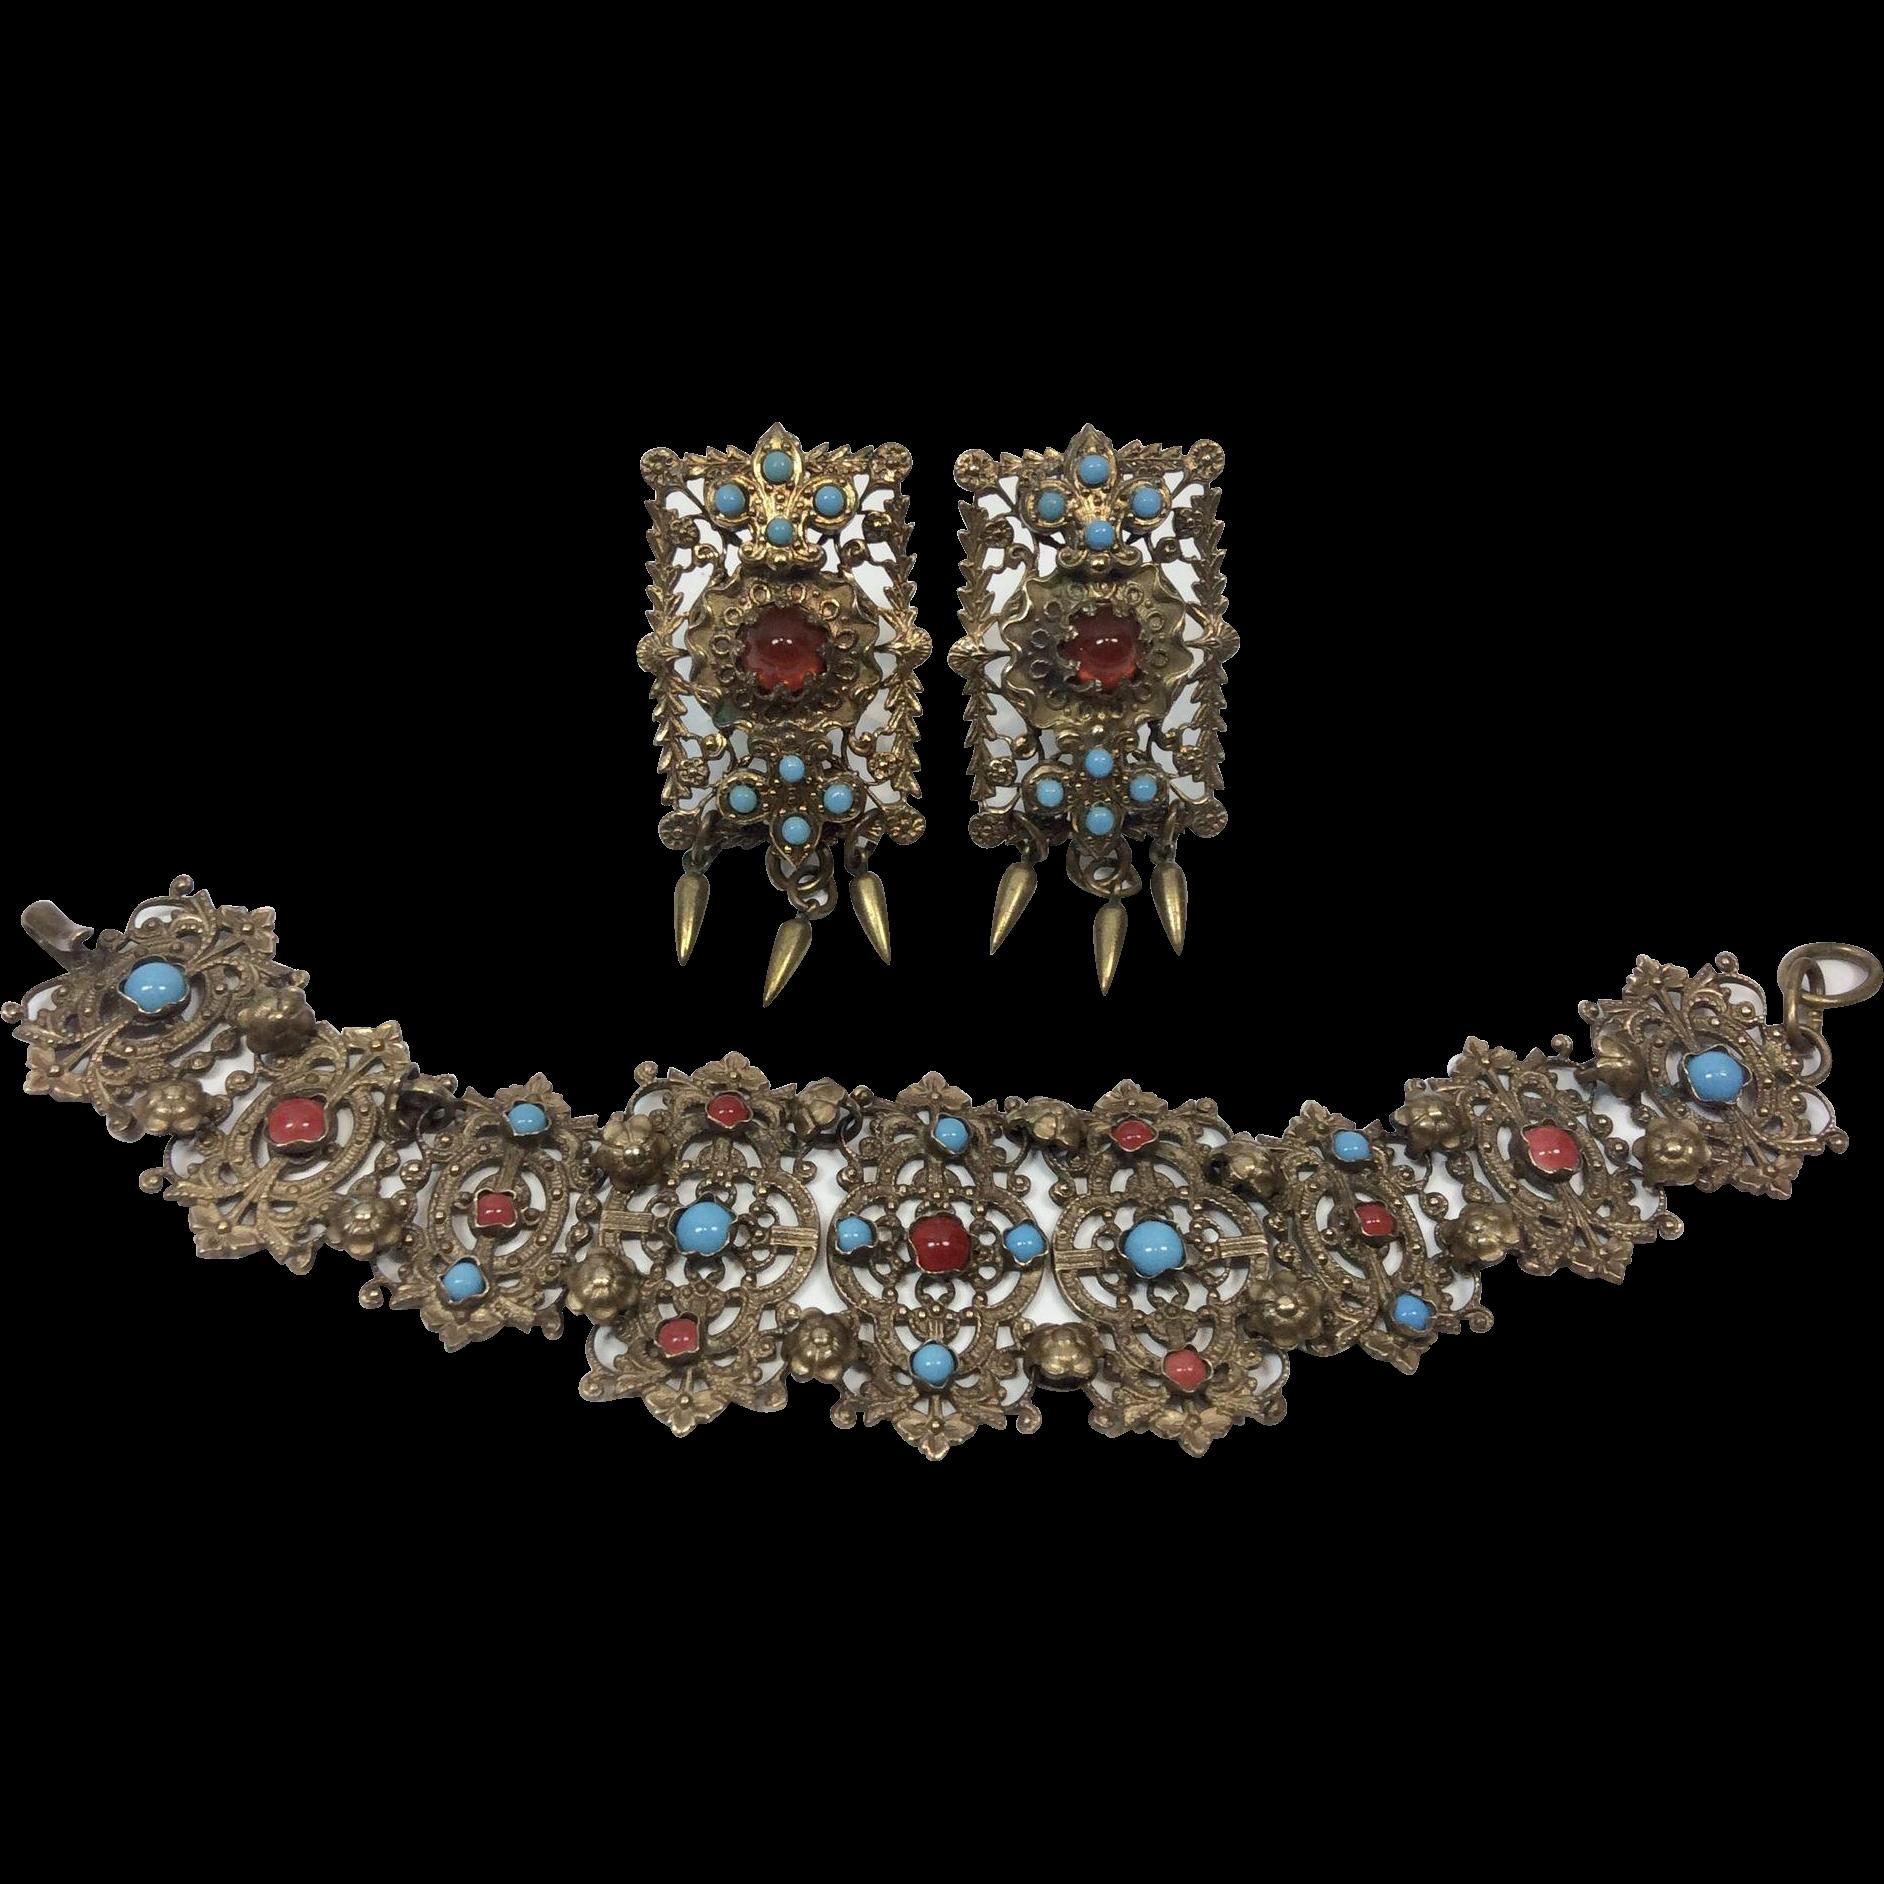 Czech Filigree Vintage Bracelet and Earrings, c. 1930